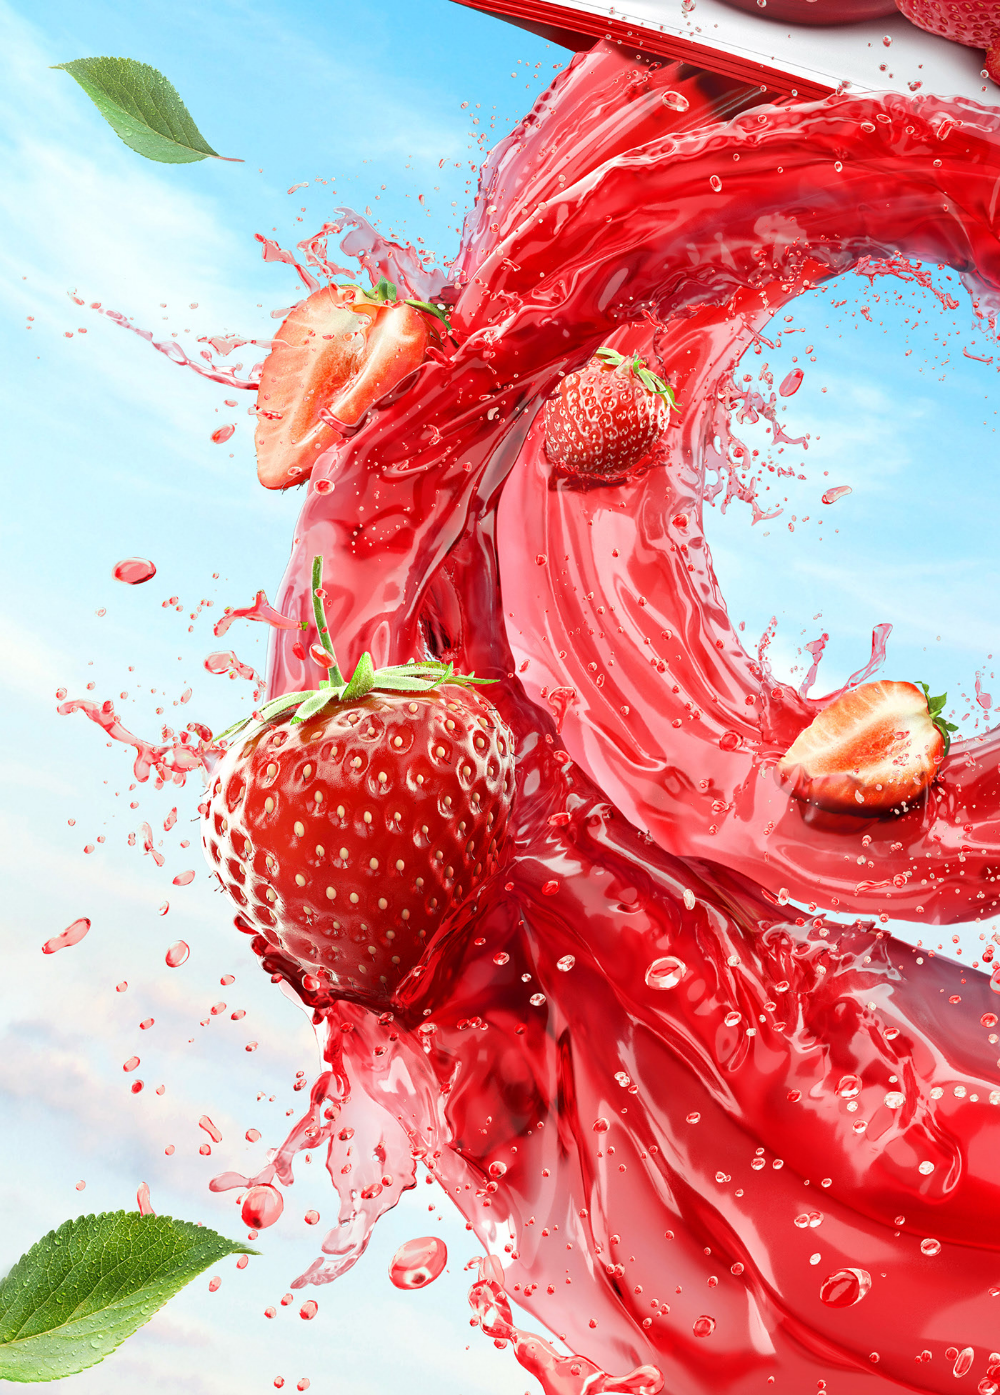 Behance For You Fruit Wallpaper Fruit Splash Food Poster Design